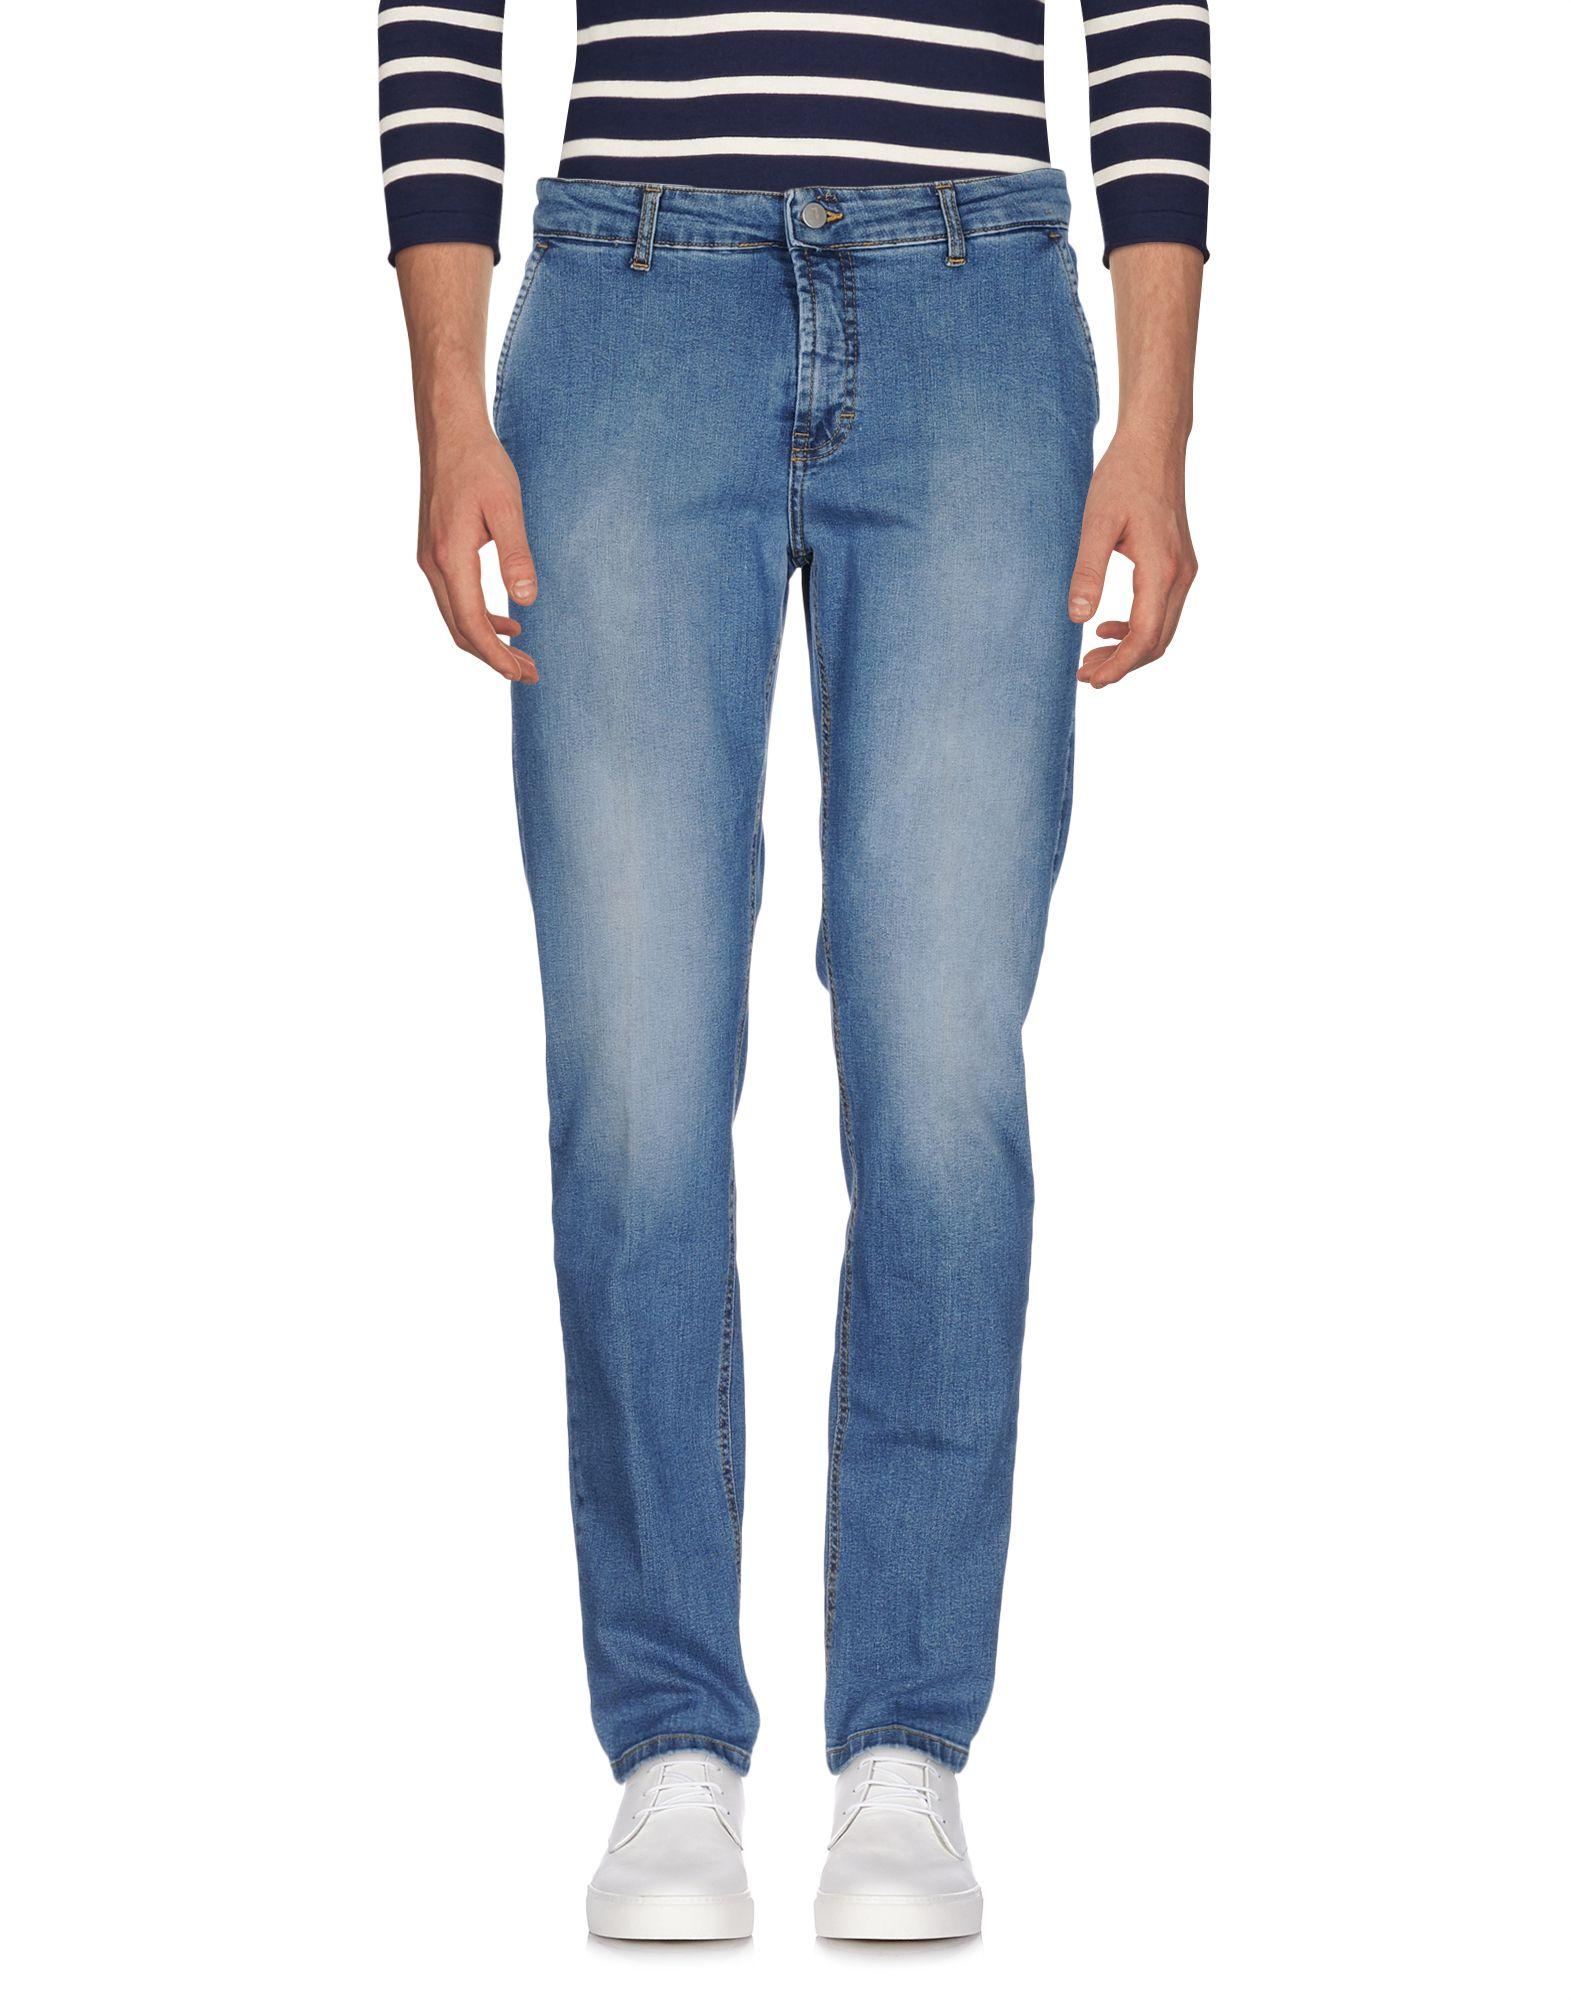 Pantaloni Jeans Tru Trussardi Uomo - 42641951HF 42641951HF 42641951HF 4e36d5